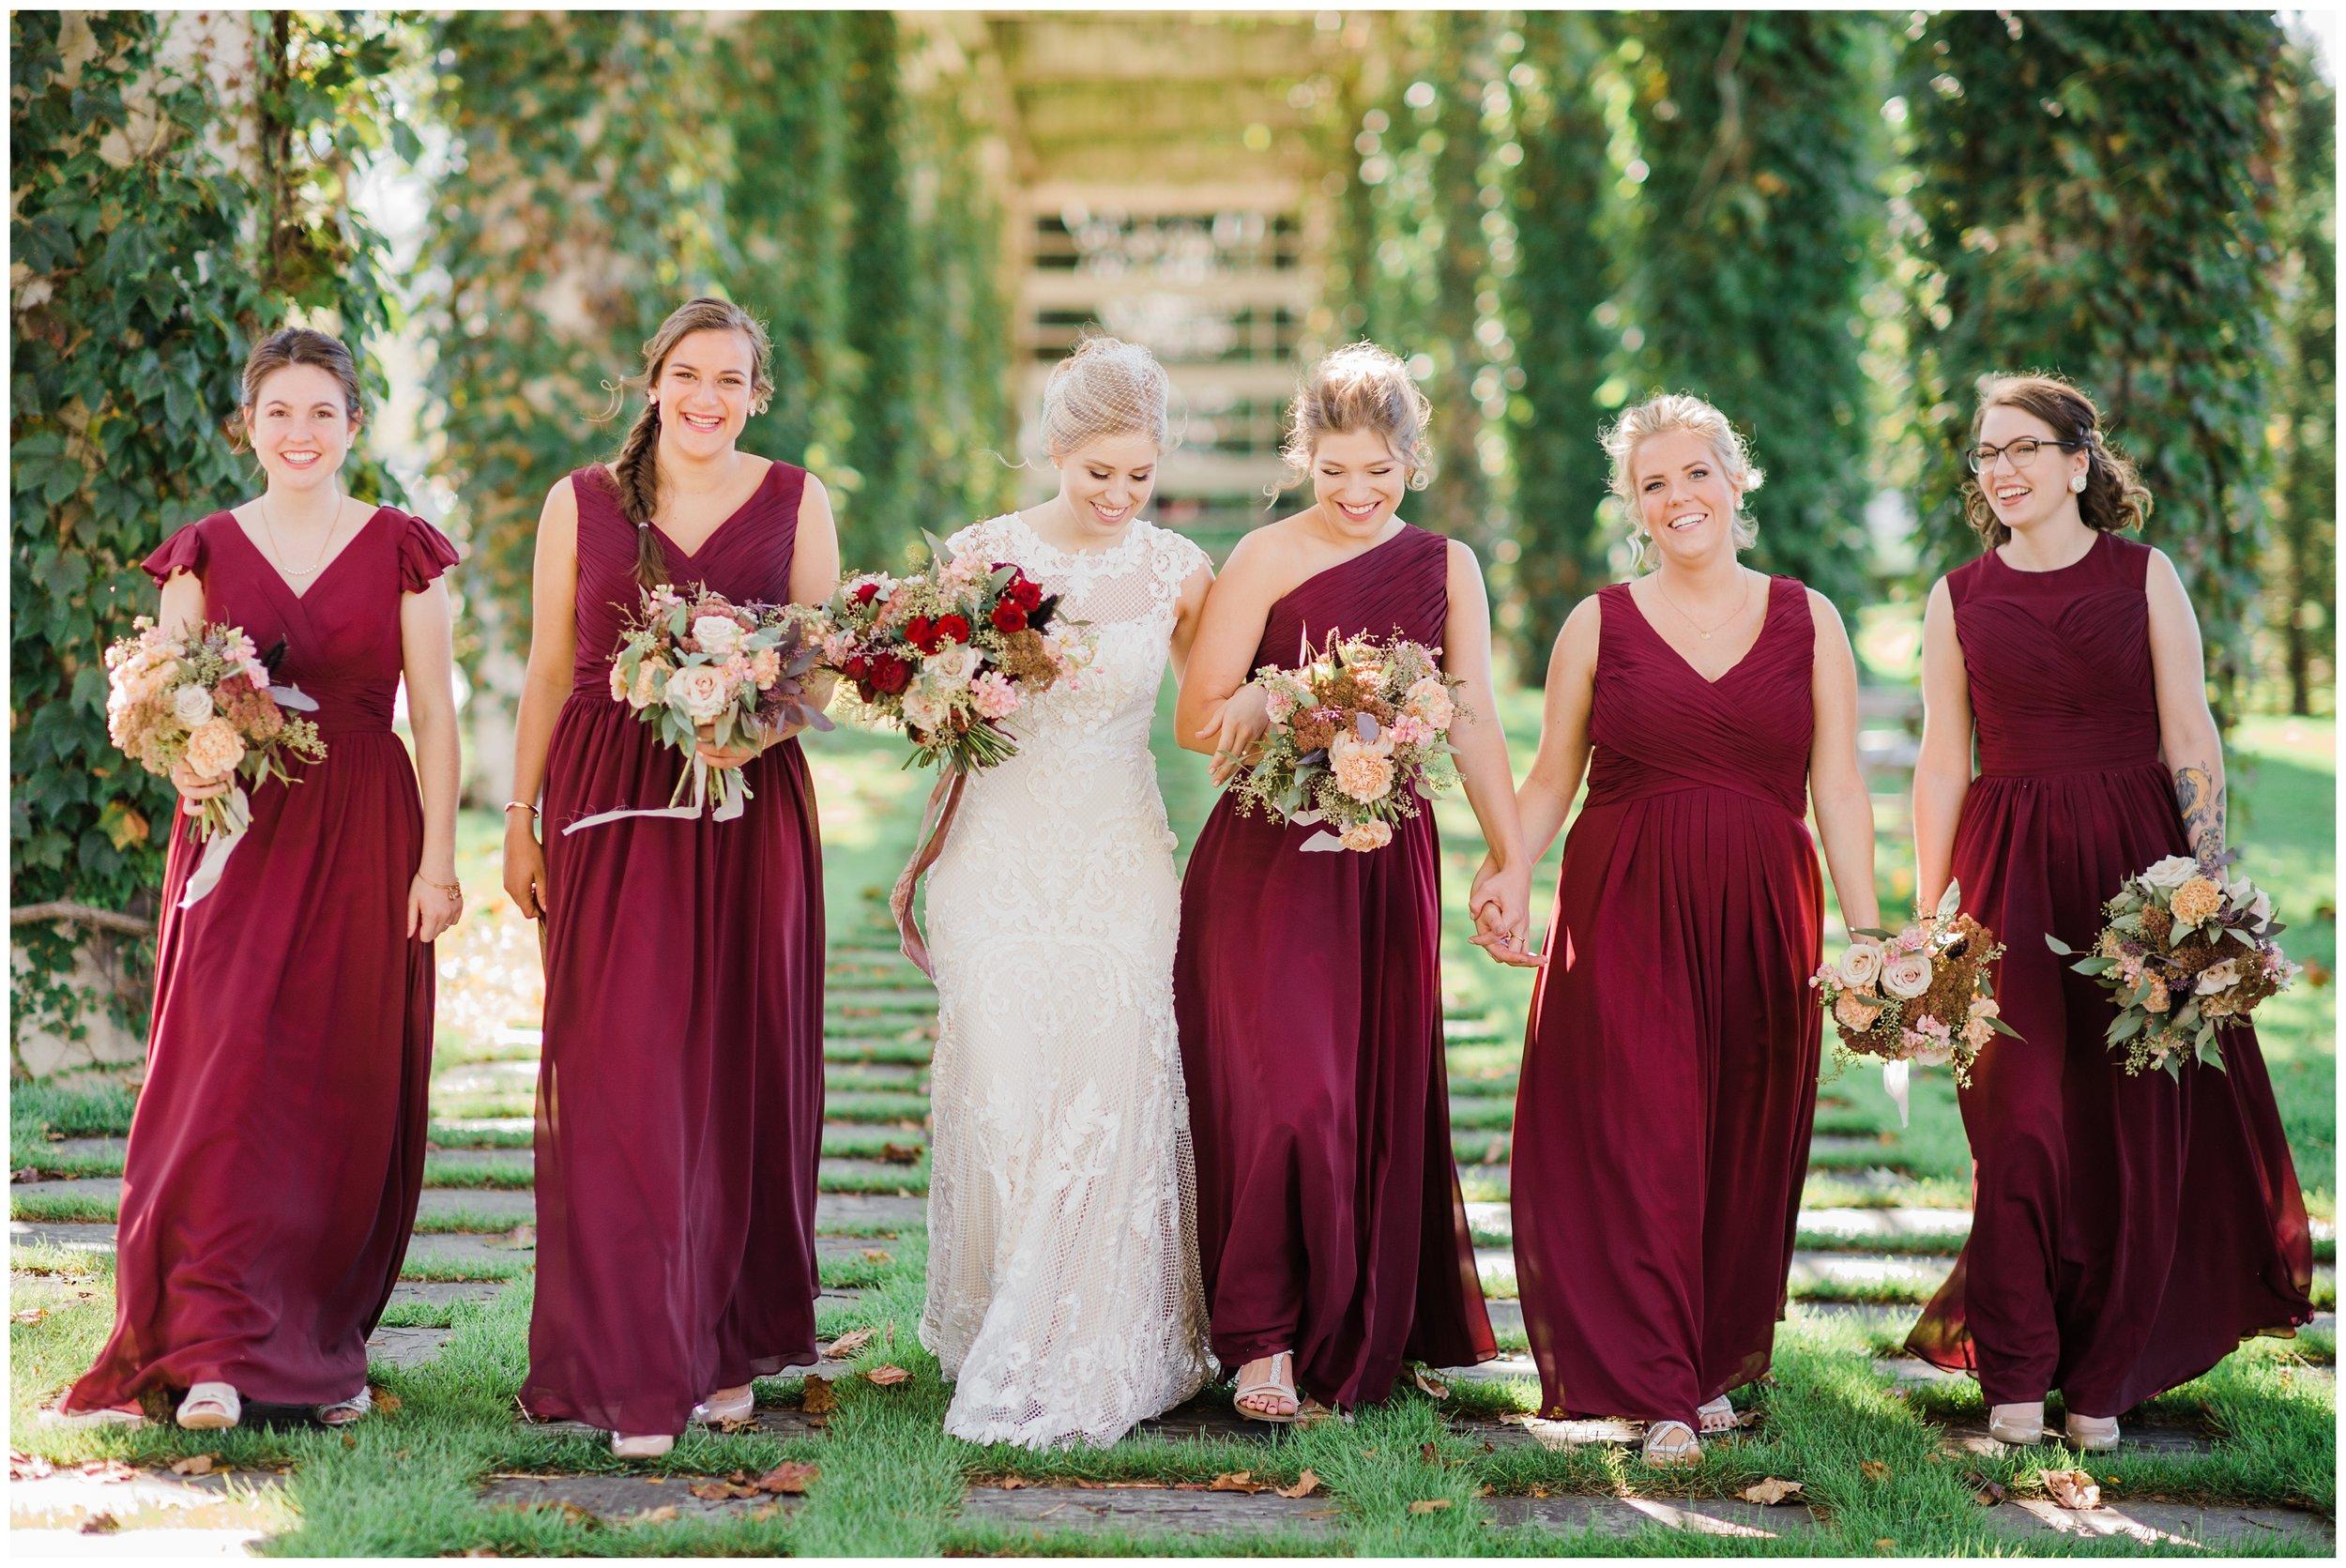 Rebecca_Shehorn_Photography_Indianapolis_Wedding_Photographer_7329.jpg